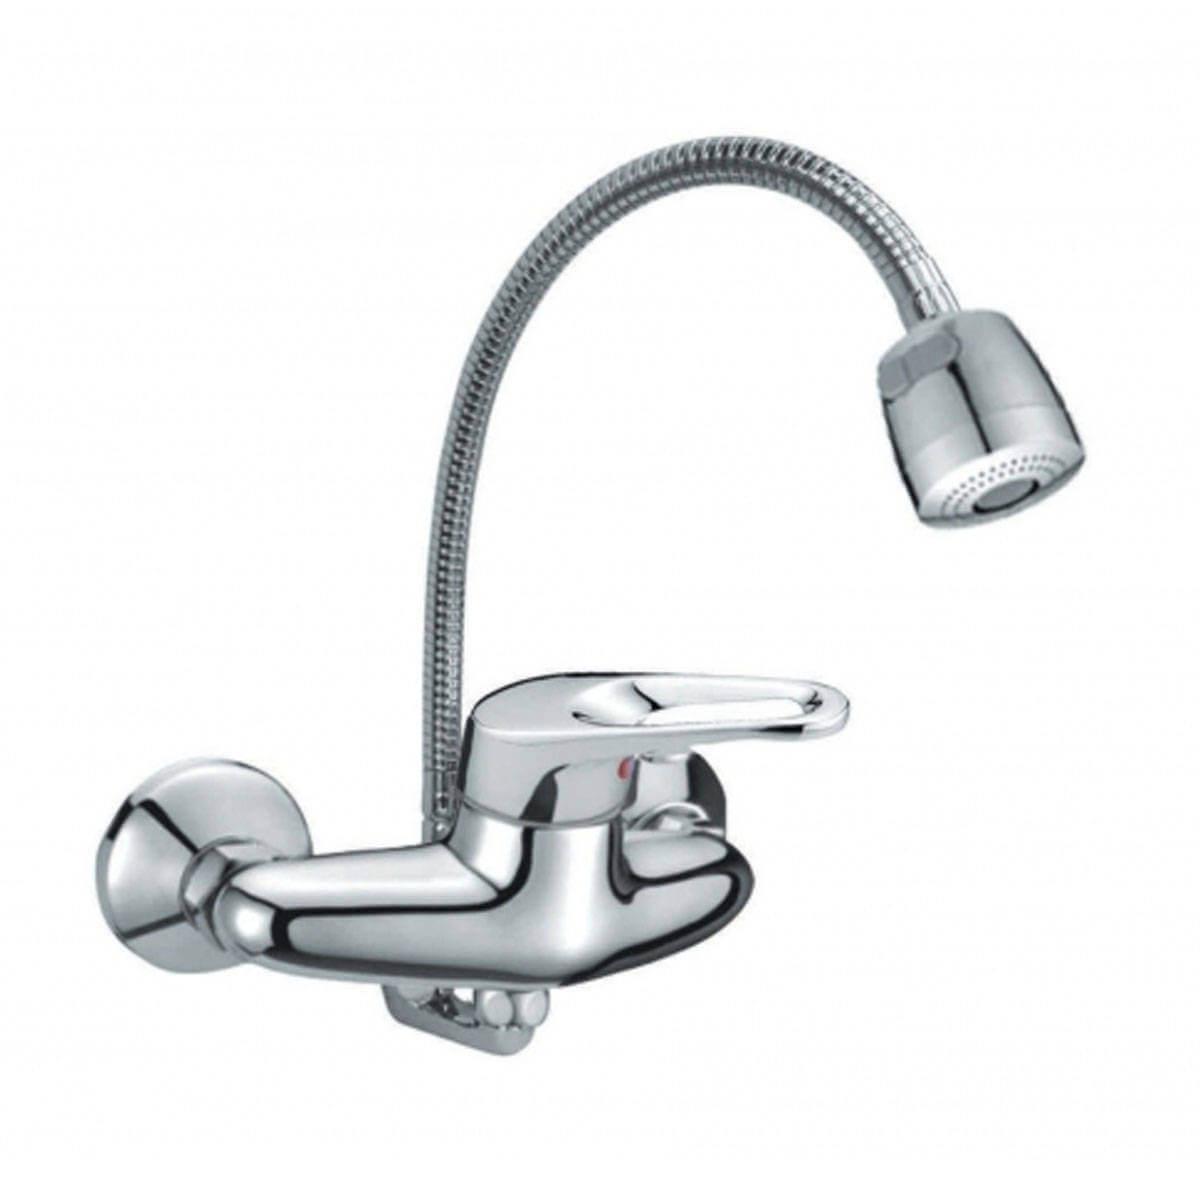 Vòi rửa bát AMTS AM 308